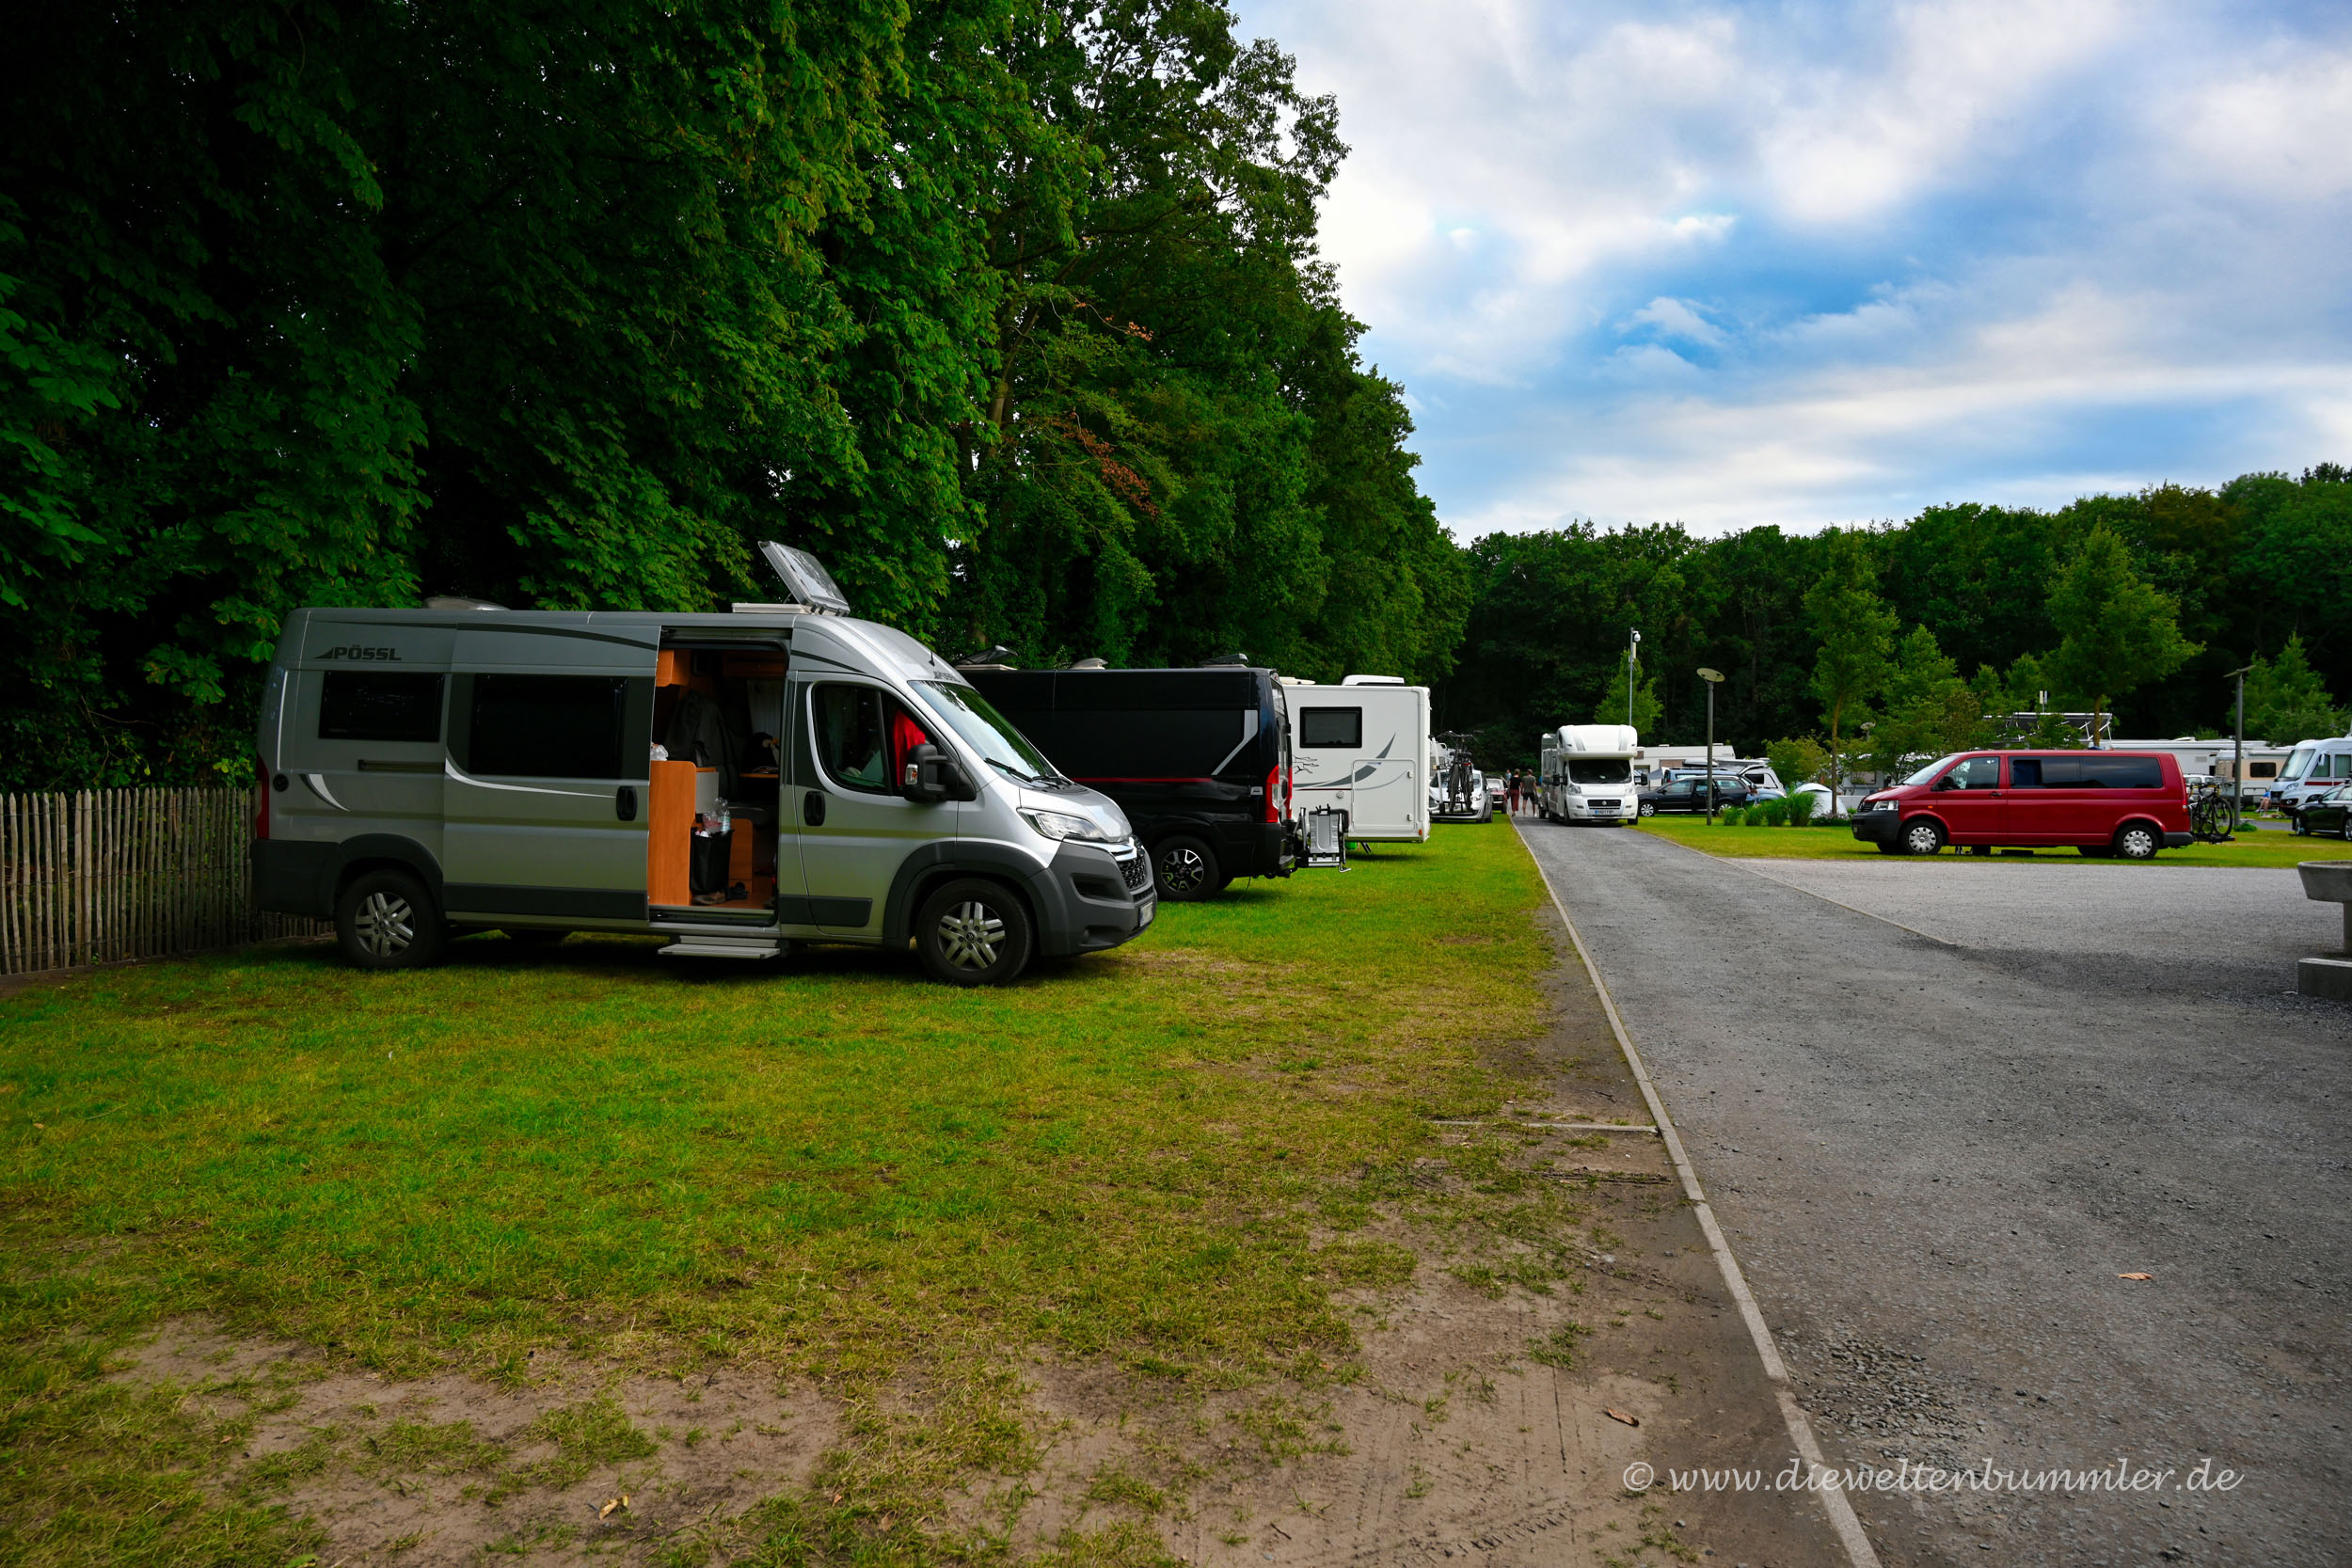 Campingplatz in Brügge